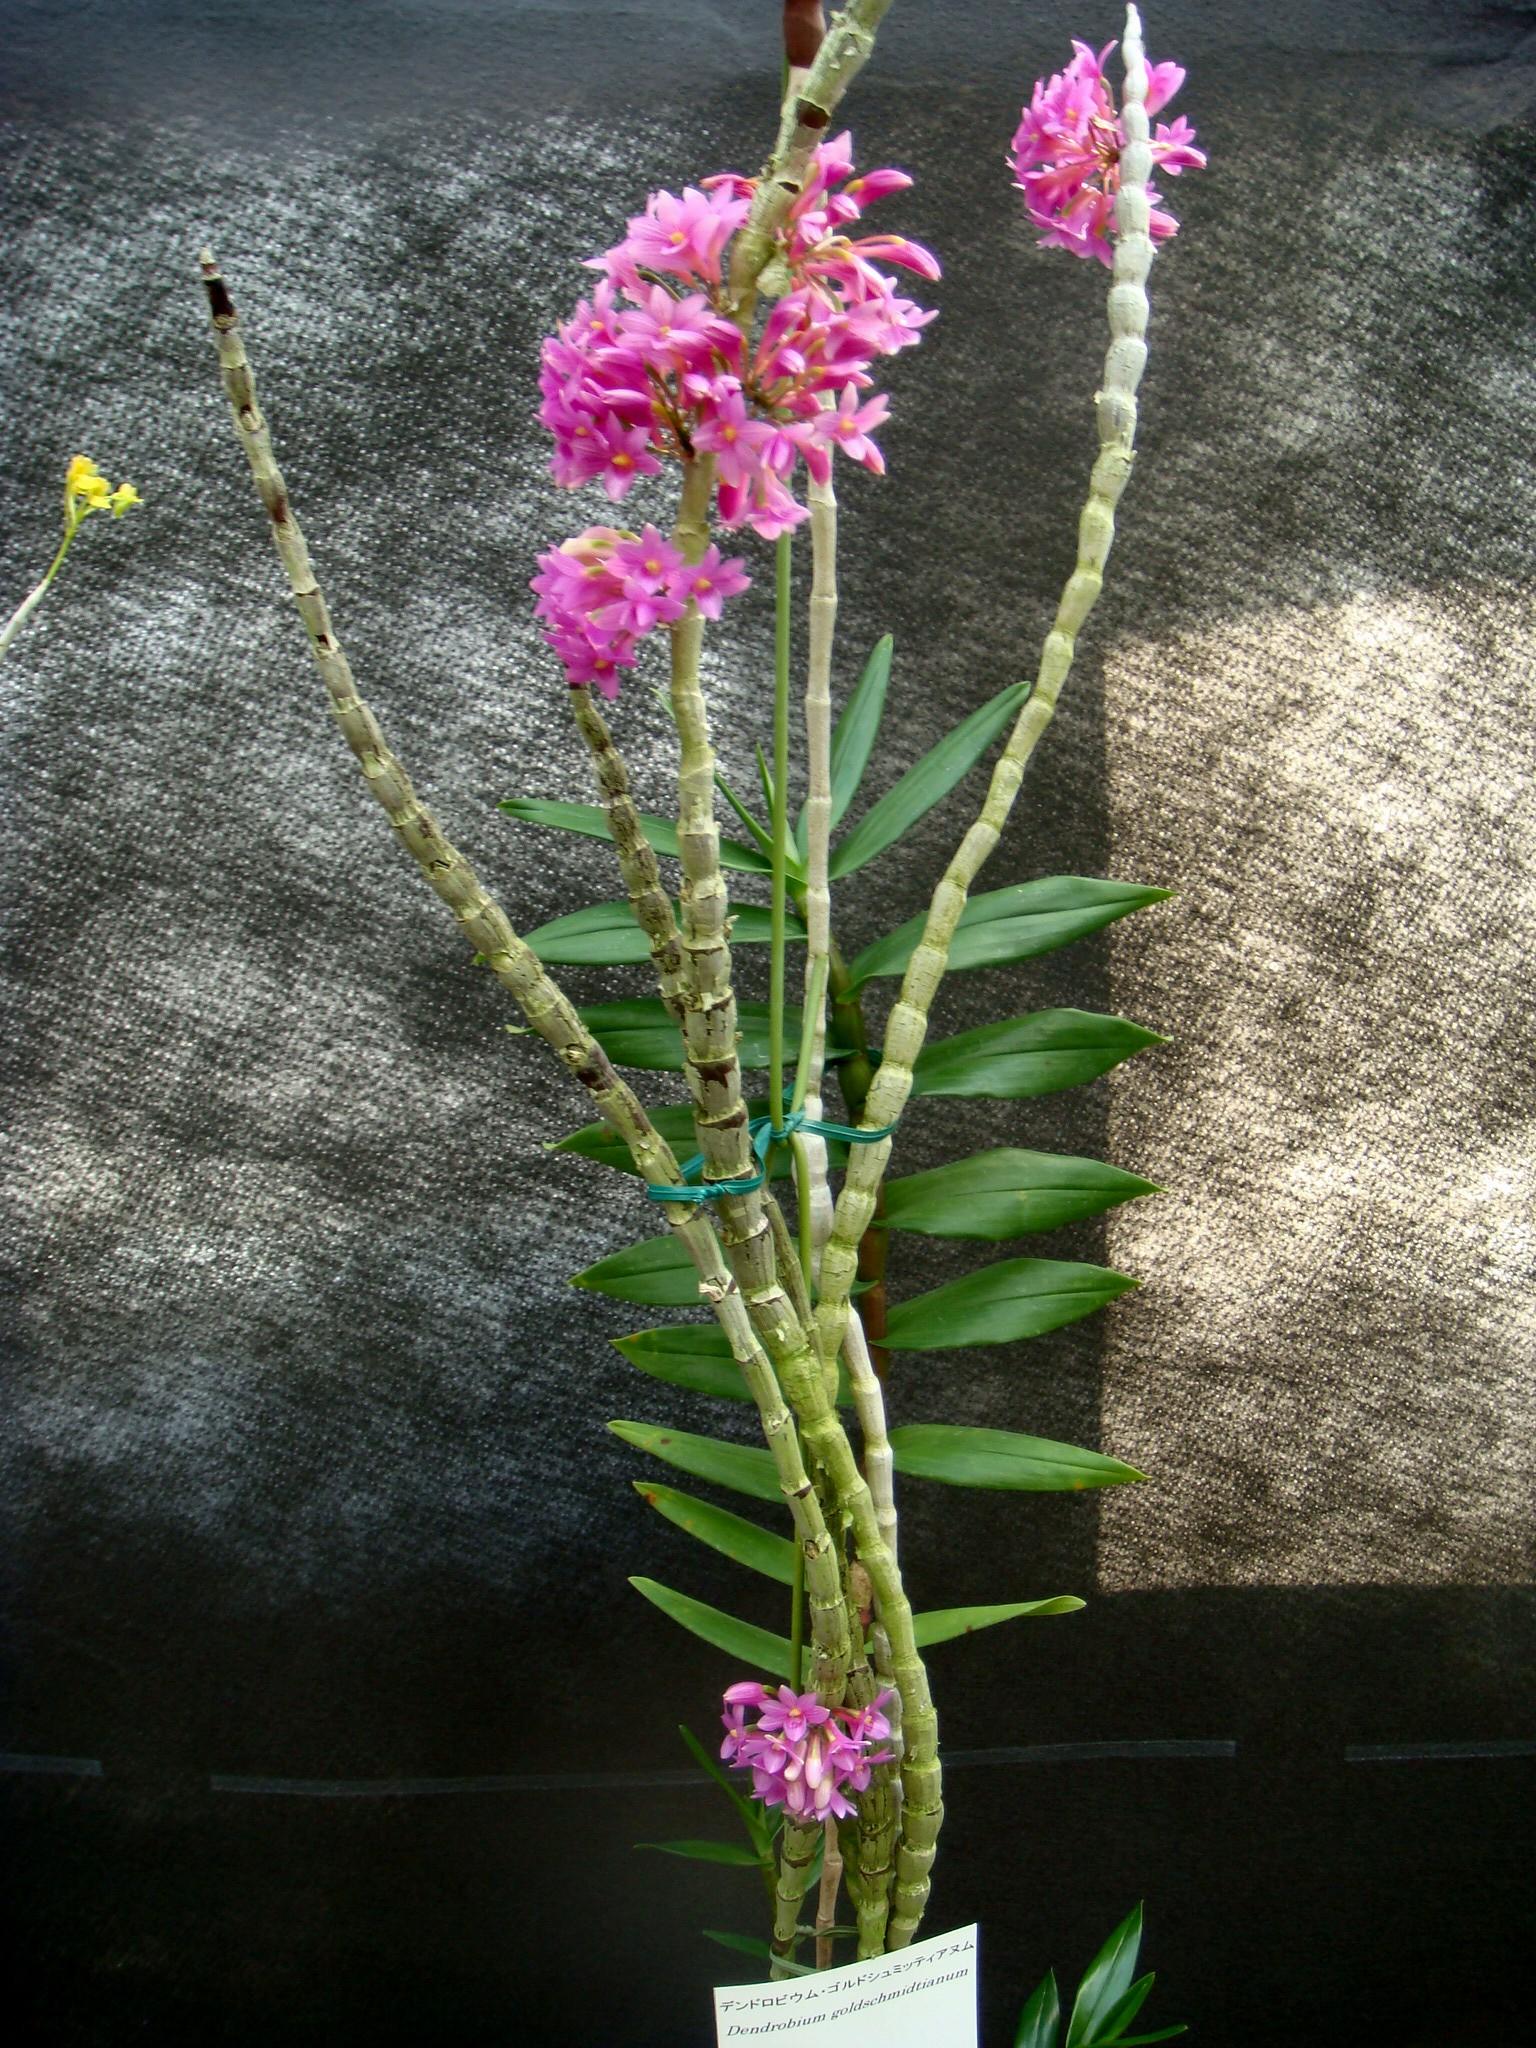 http://orchids.la.coocan.jp/Dendrobium/Dendrobium%20goldschmidtianum/DSC04963.JPG